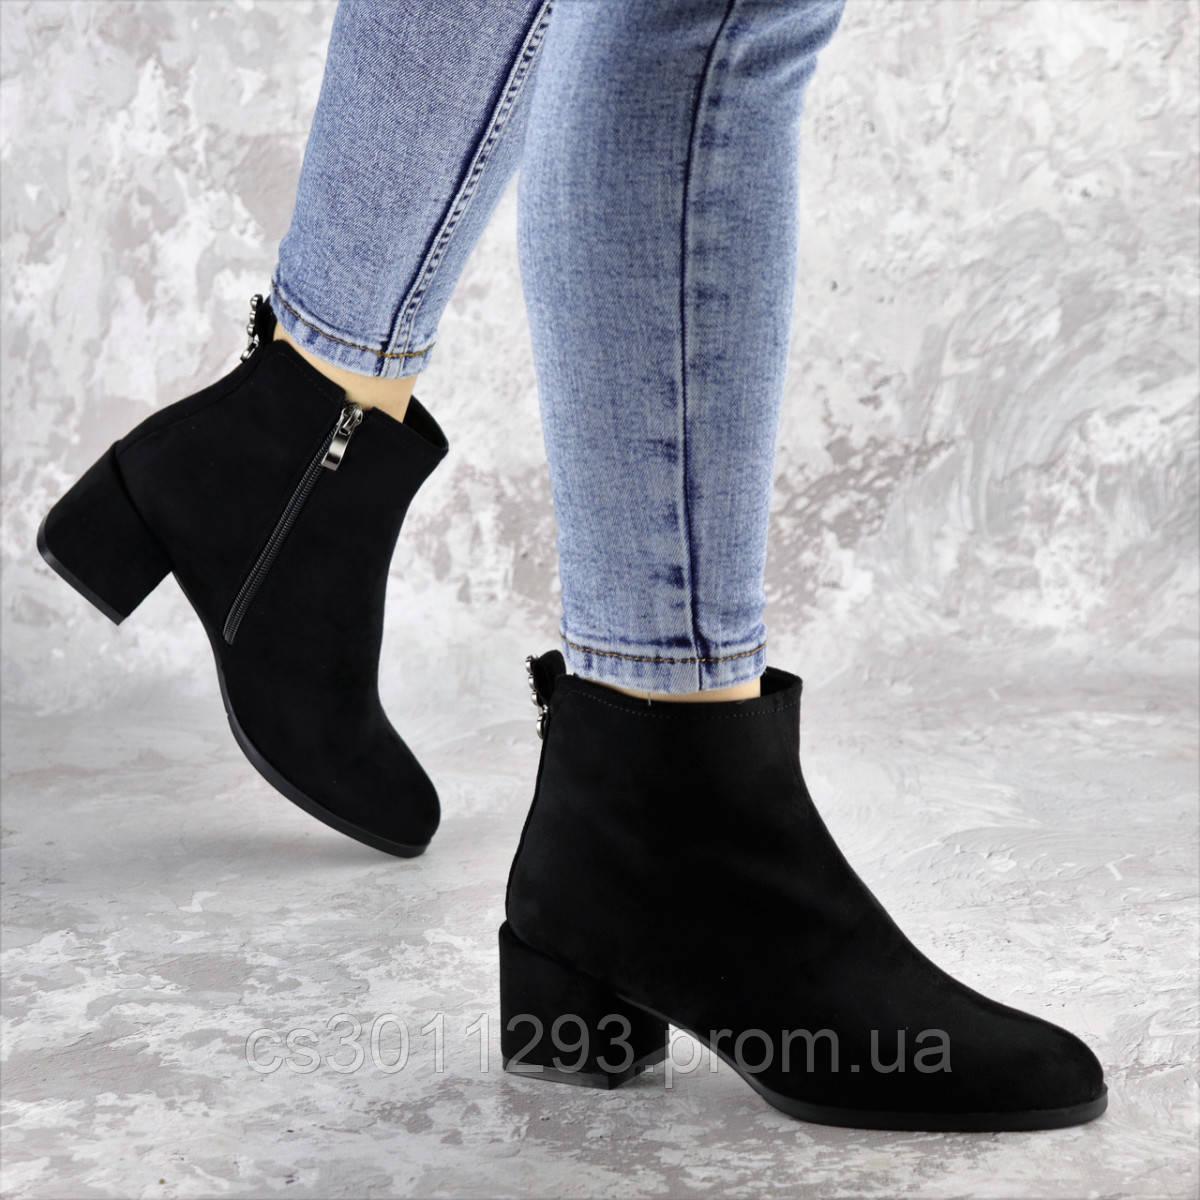 Ботильоны женские Fashion Tyrone 2414 36 размер 23,5 см Черный